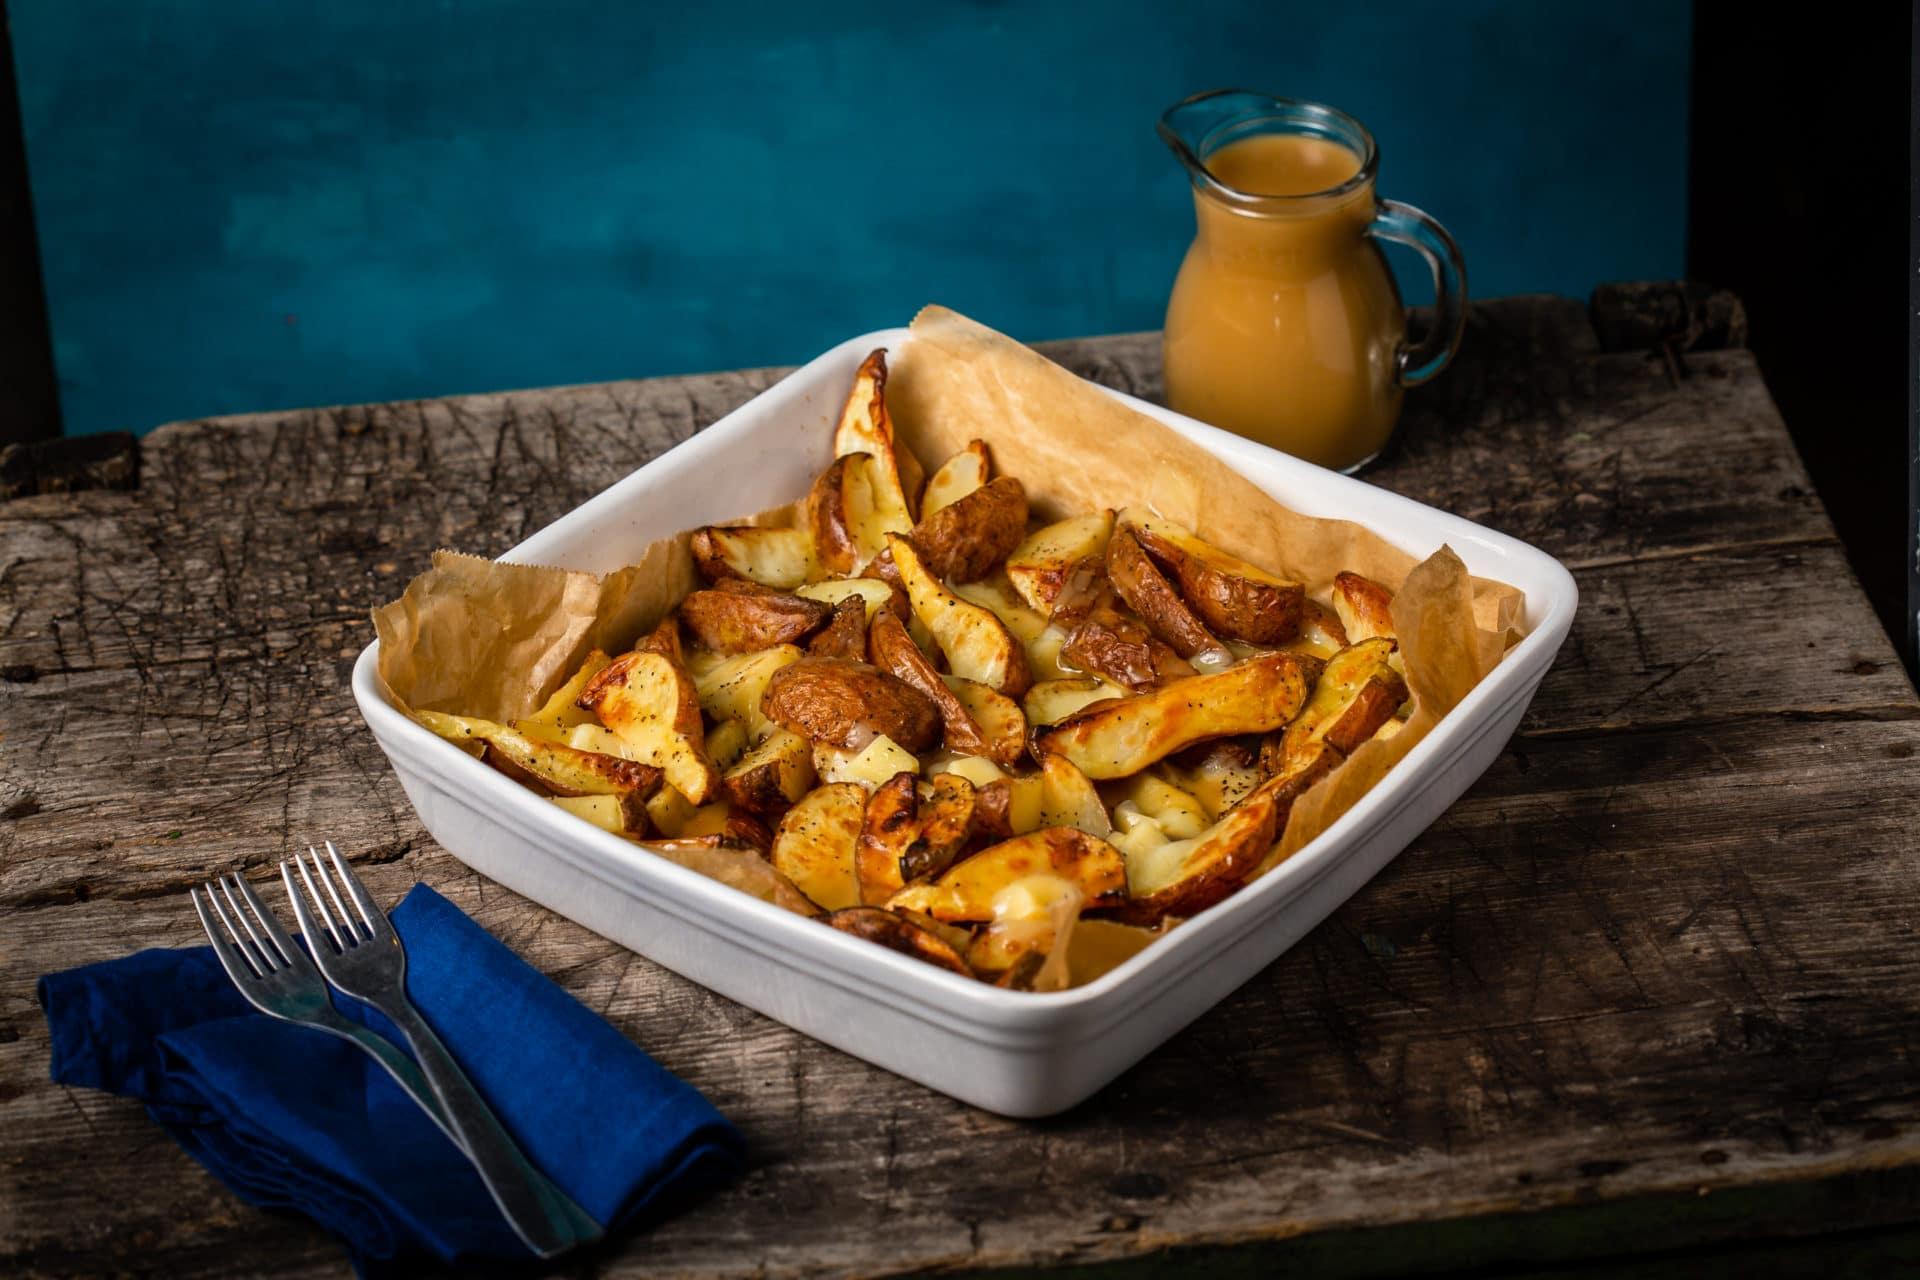 poutine kanadai sültkrumpli